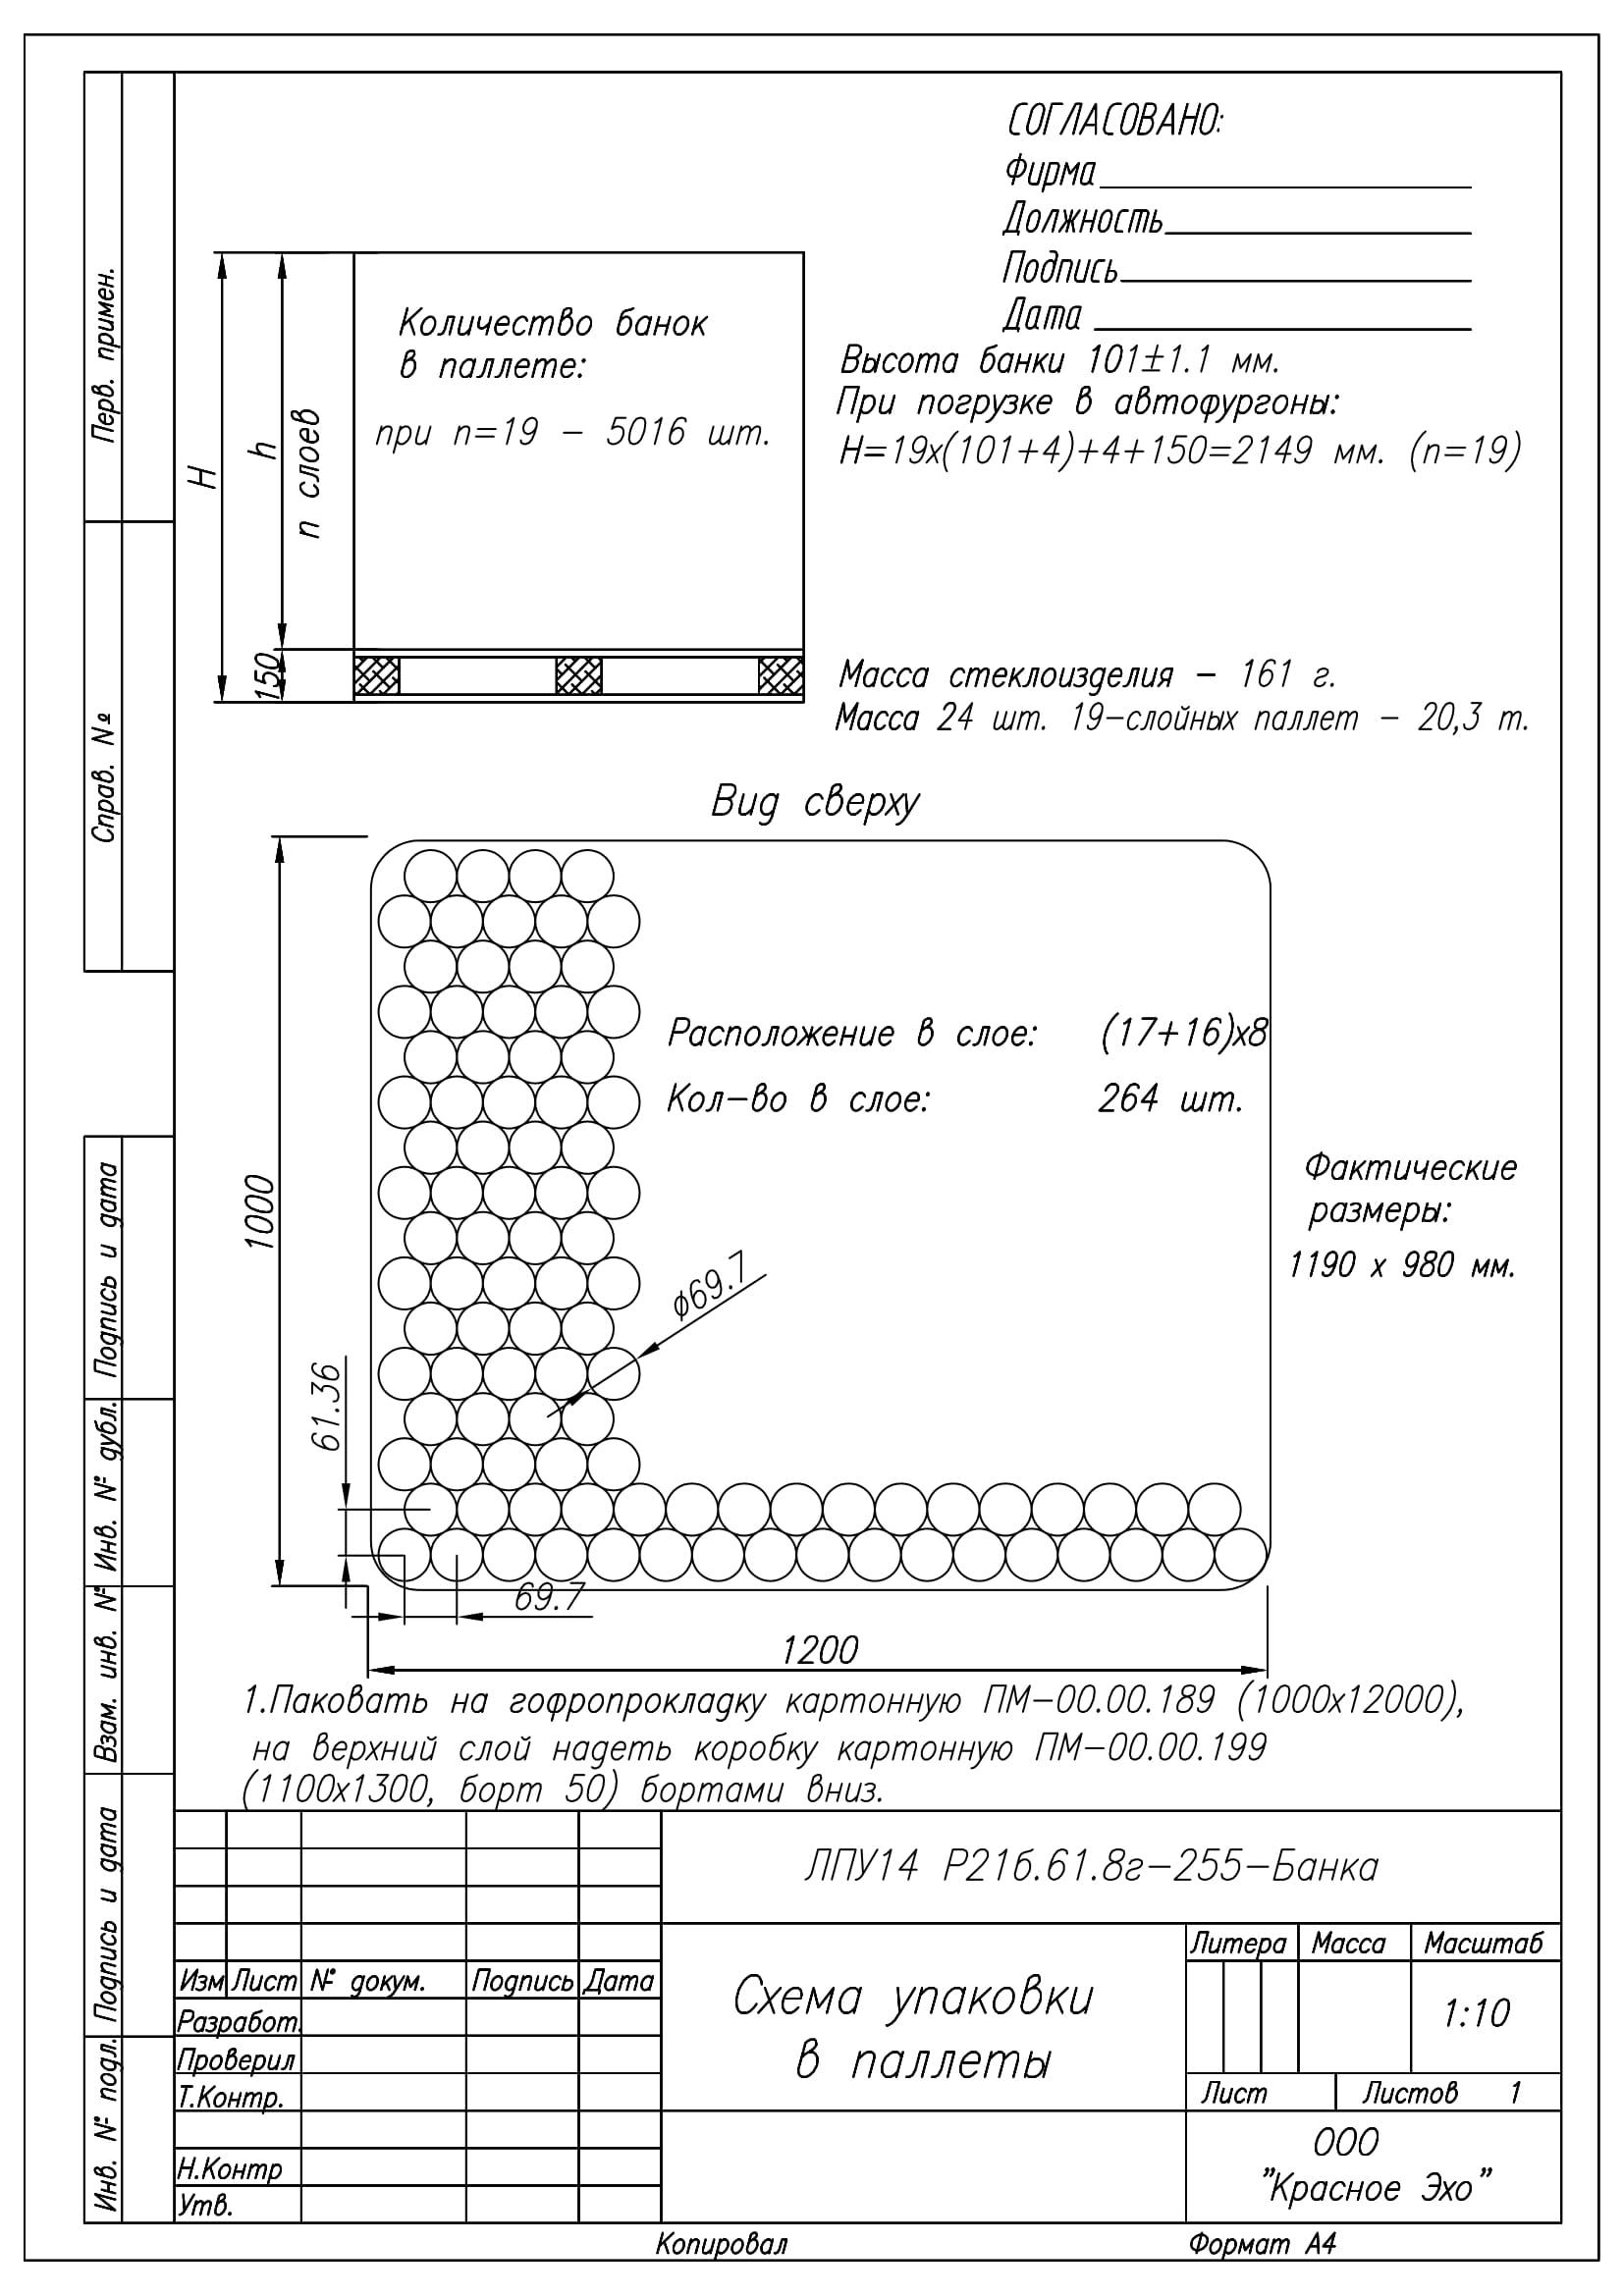 Банка Р21б.61.8г.255 (пал.5016)